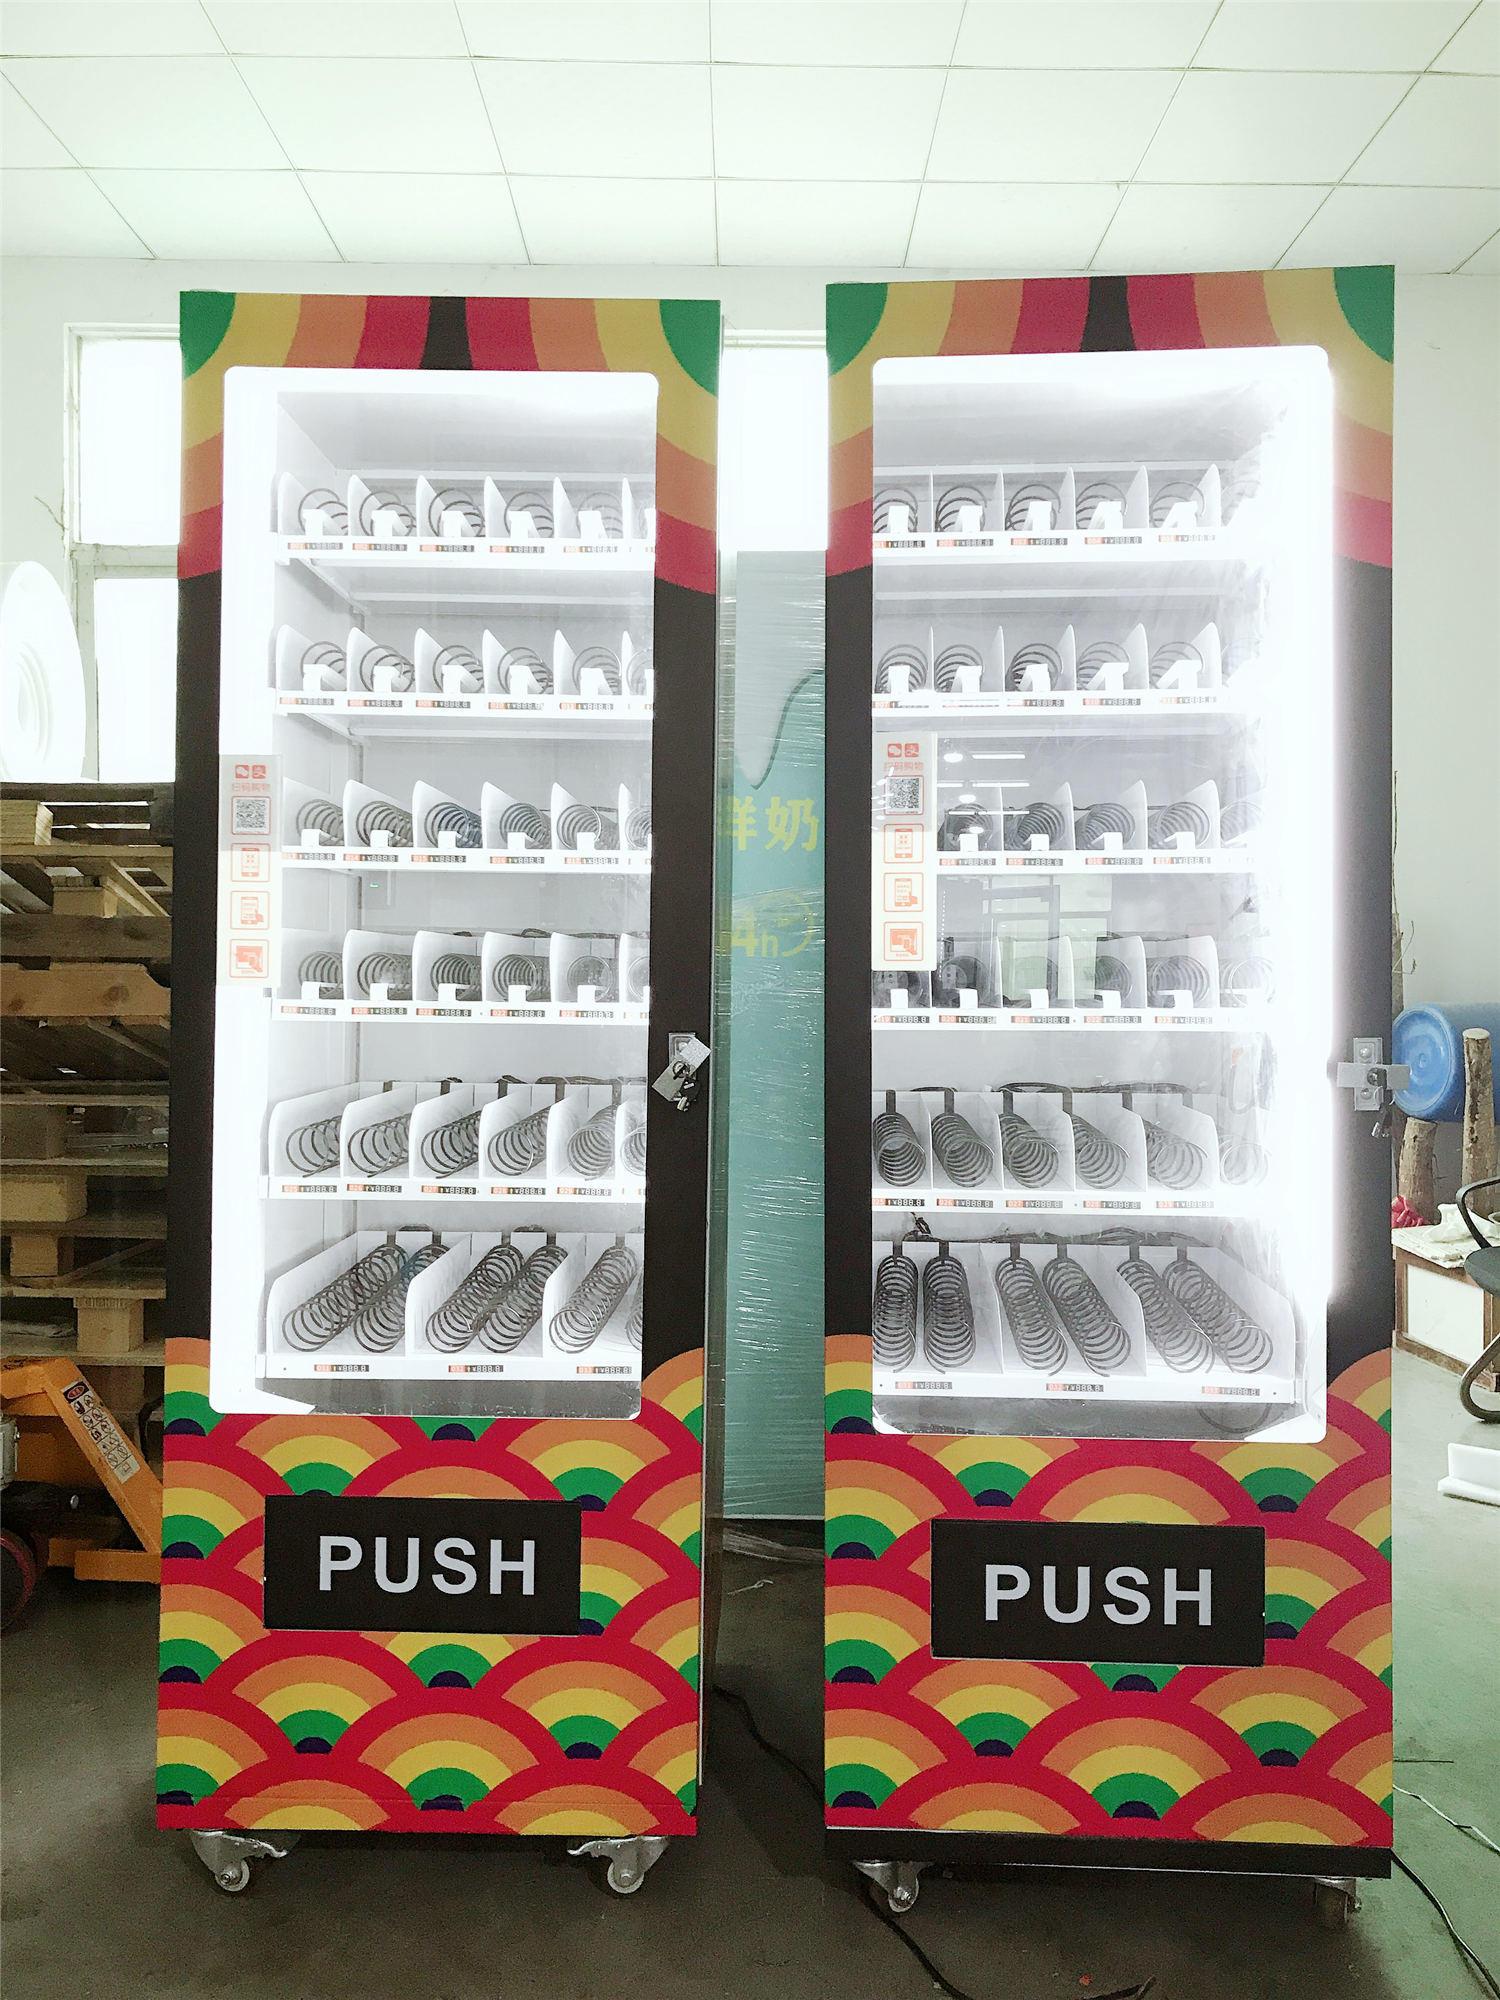 36-slot vending machine